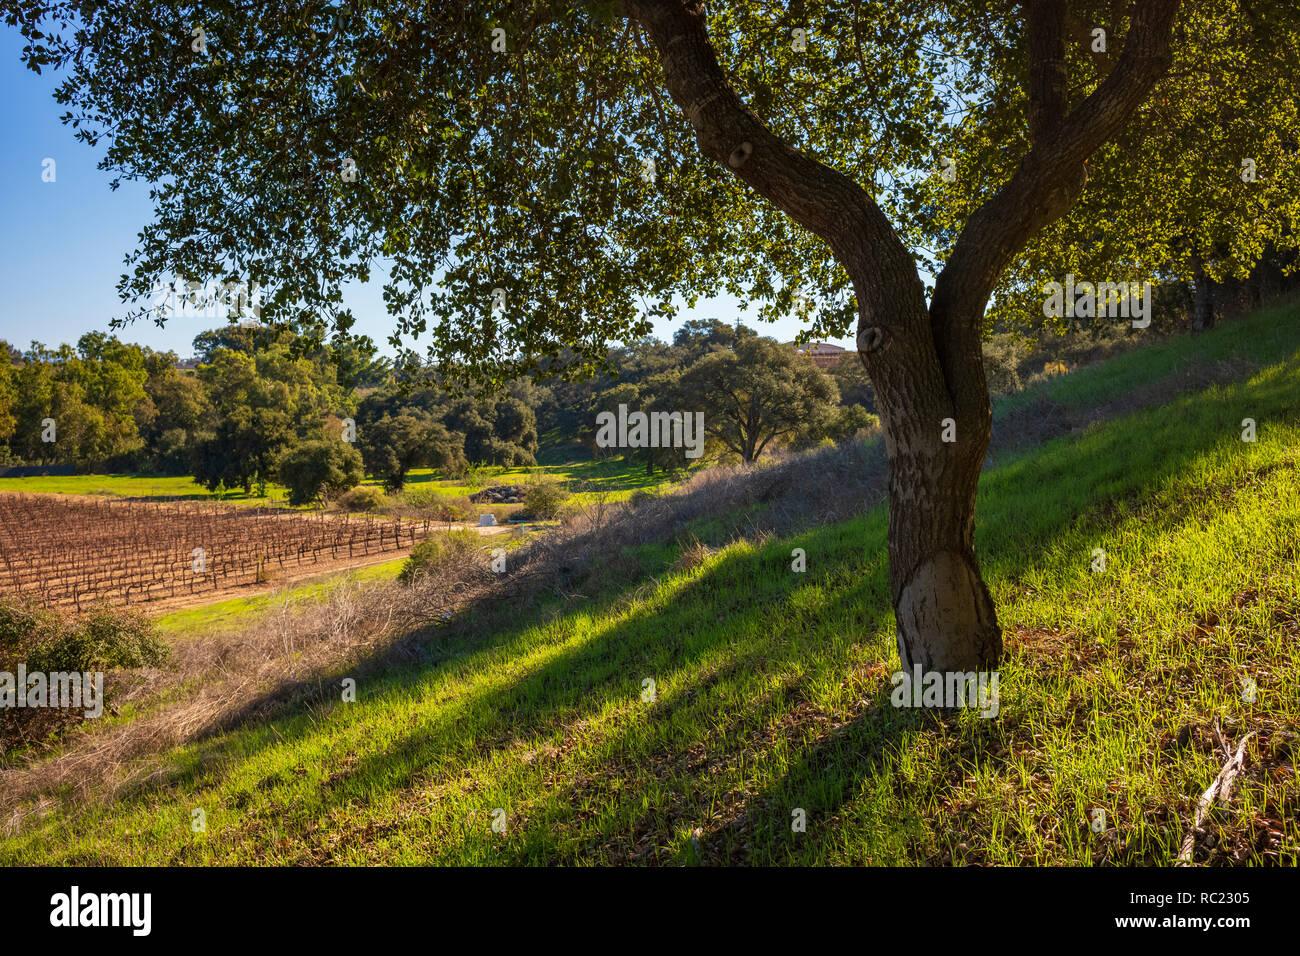 Vineyard of the Santa Maria valley, California. Stock Photo